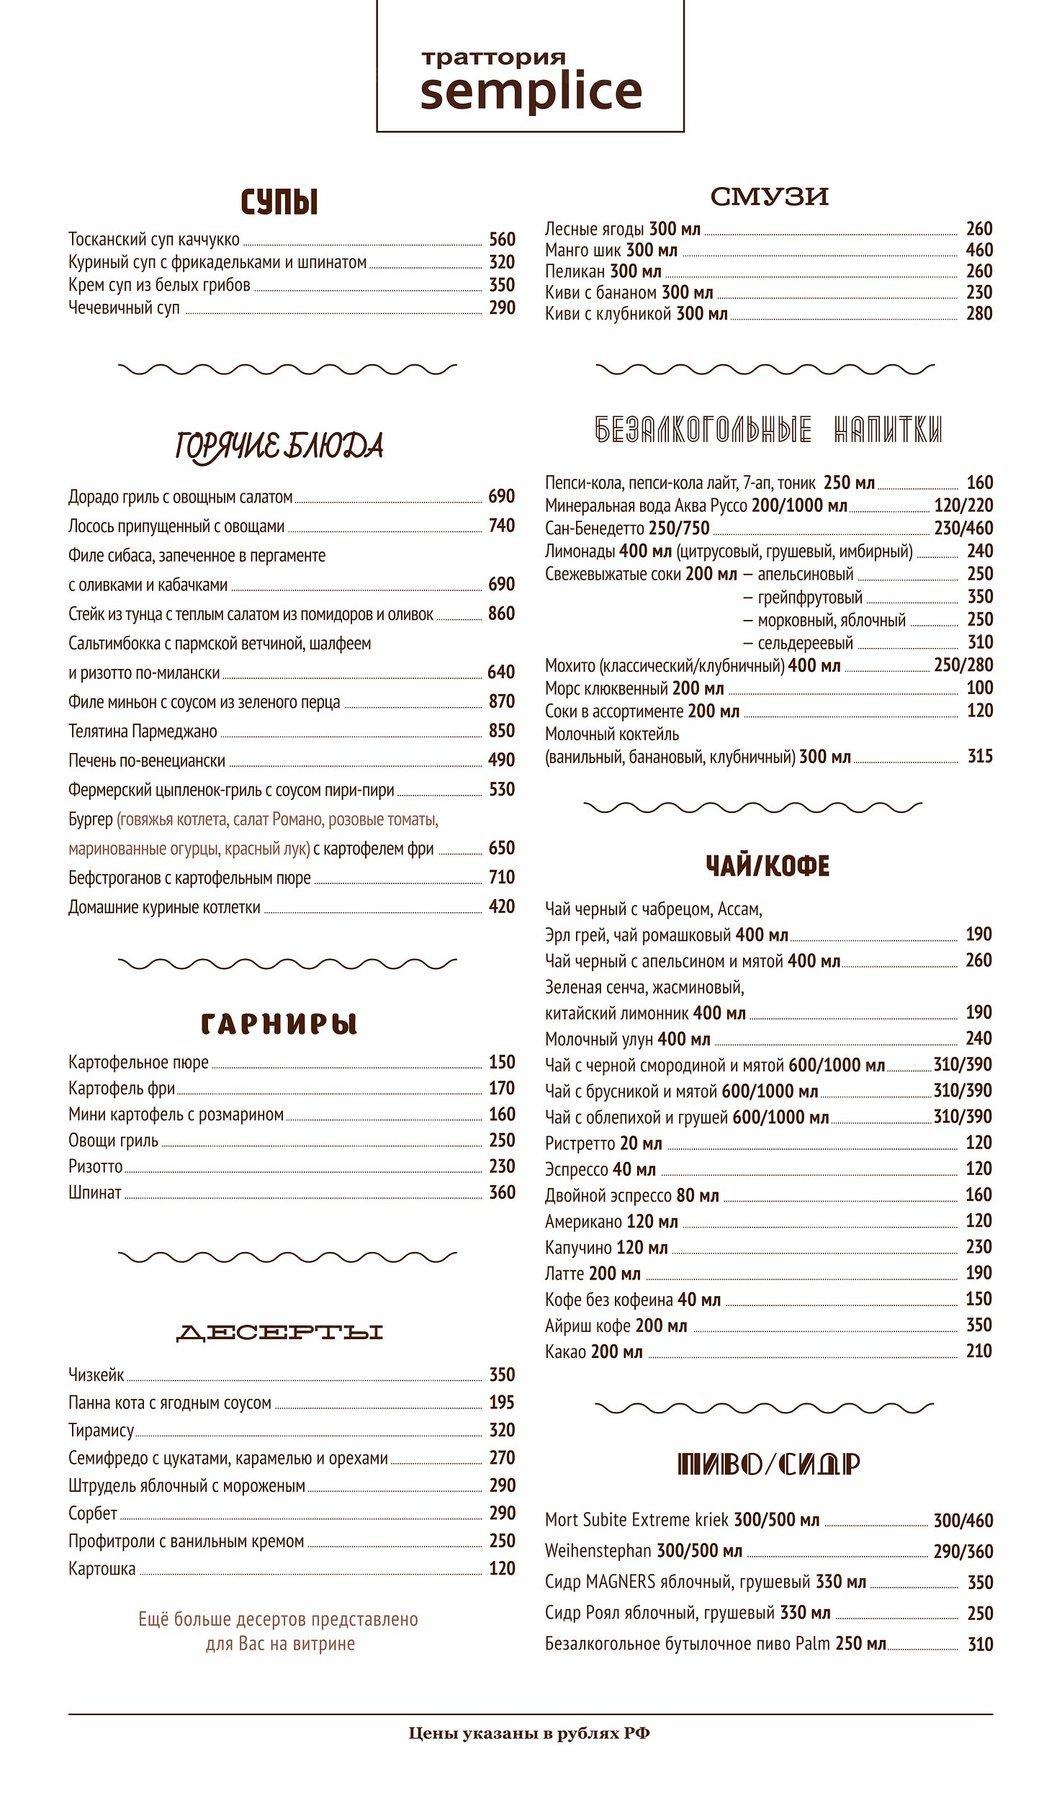 Меню ресторана Semplice (Траттория Семпличе) на улице Чаплыгина фото 2